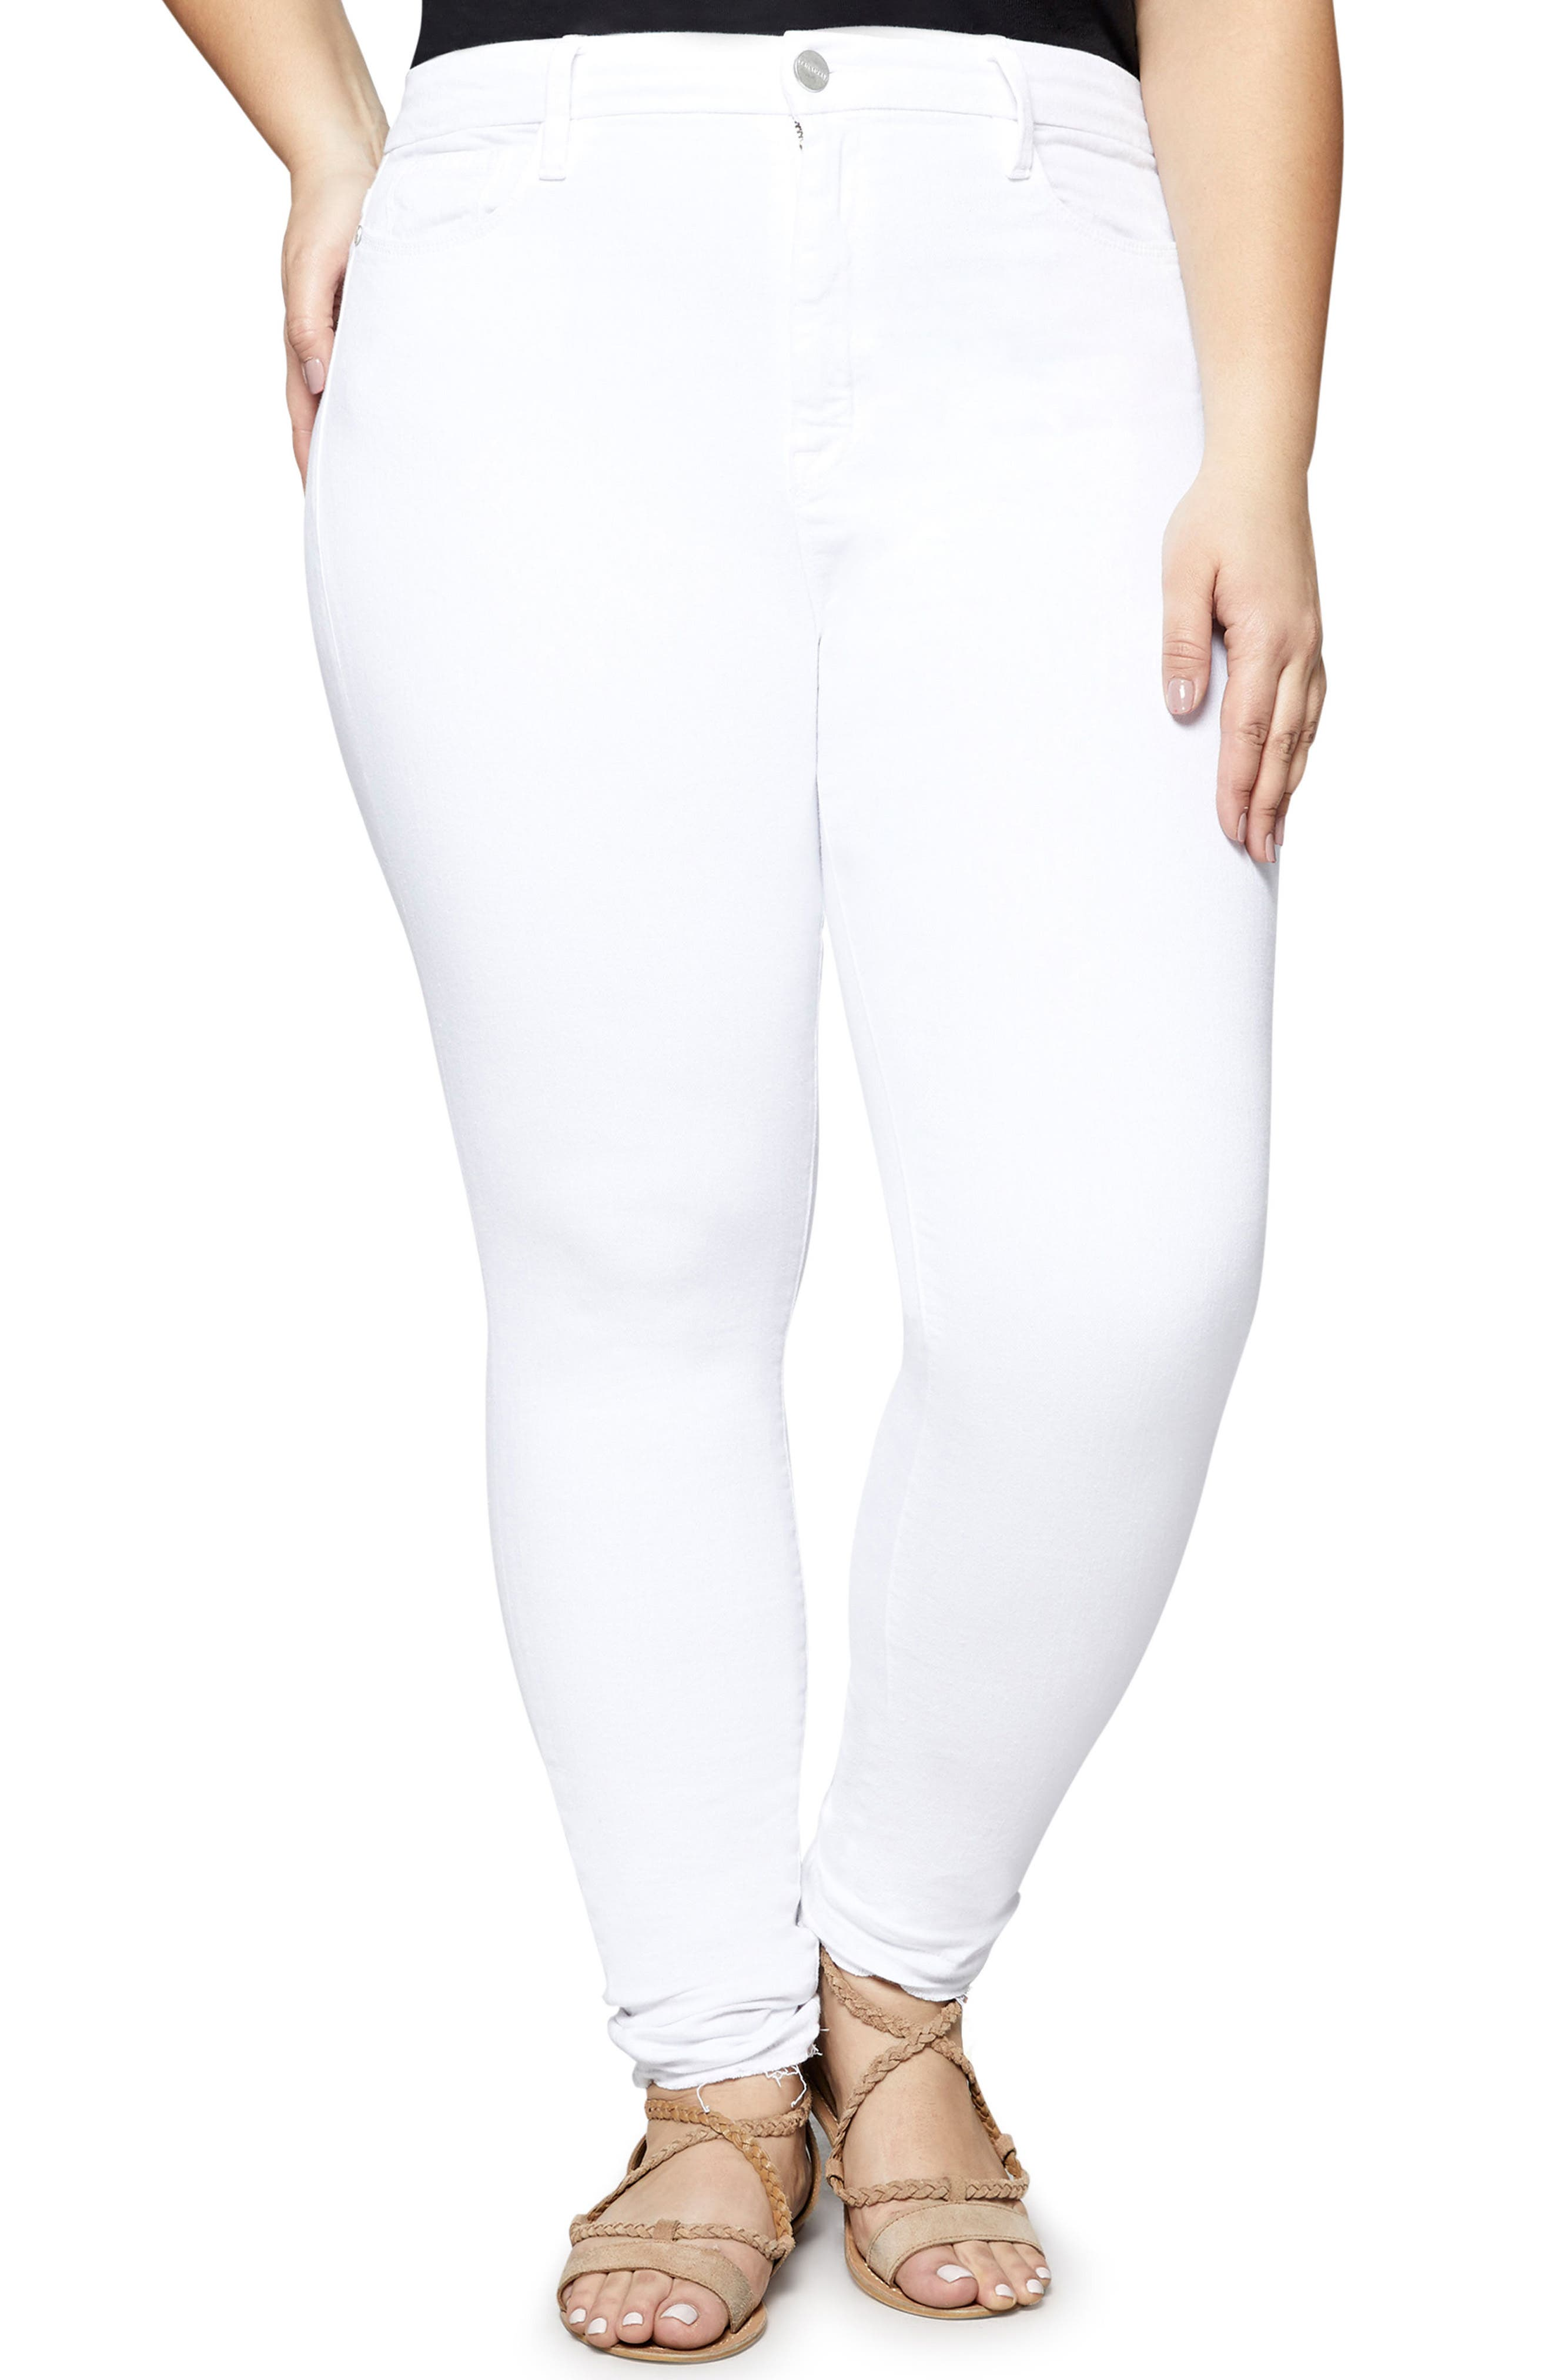 Saige Skinny Jeans,                             Main thumbnail 1, color,                             114